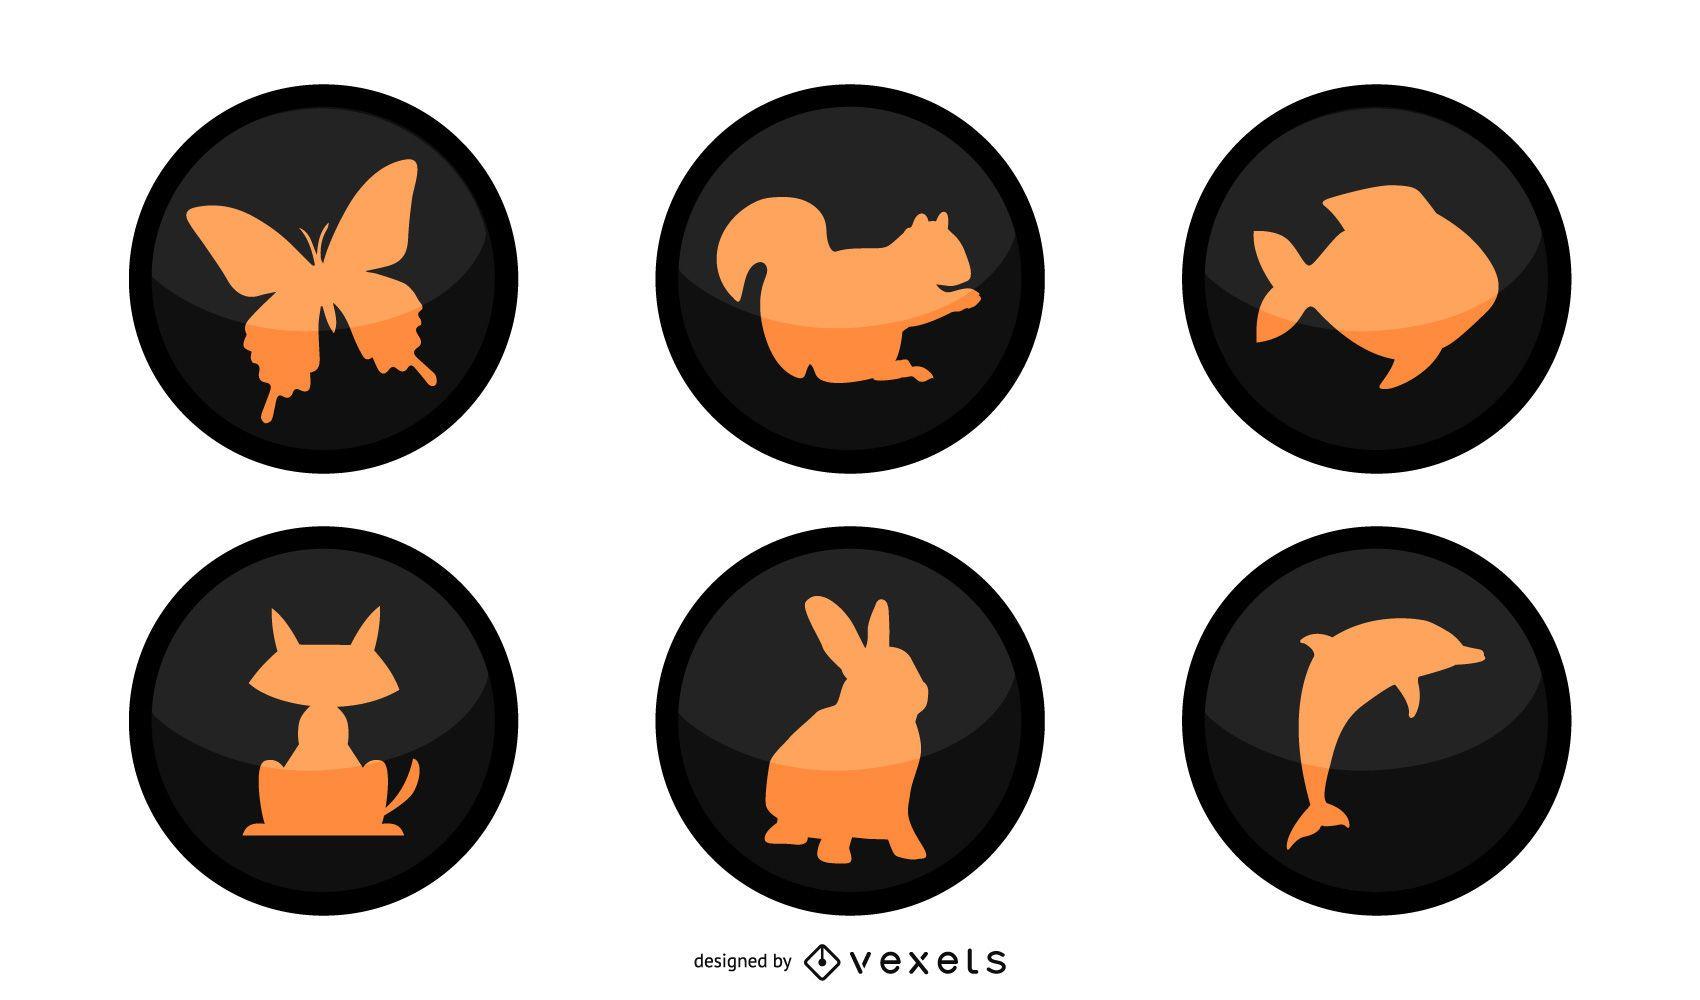 Botones circulares negros silueta animales